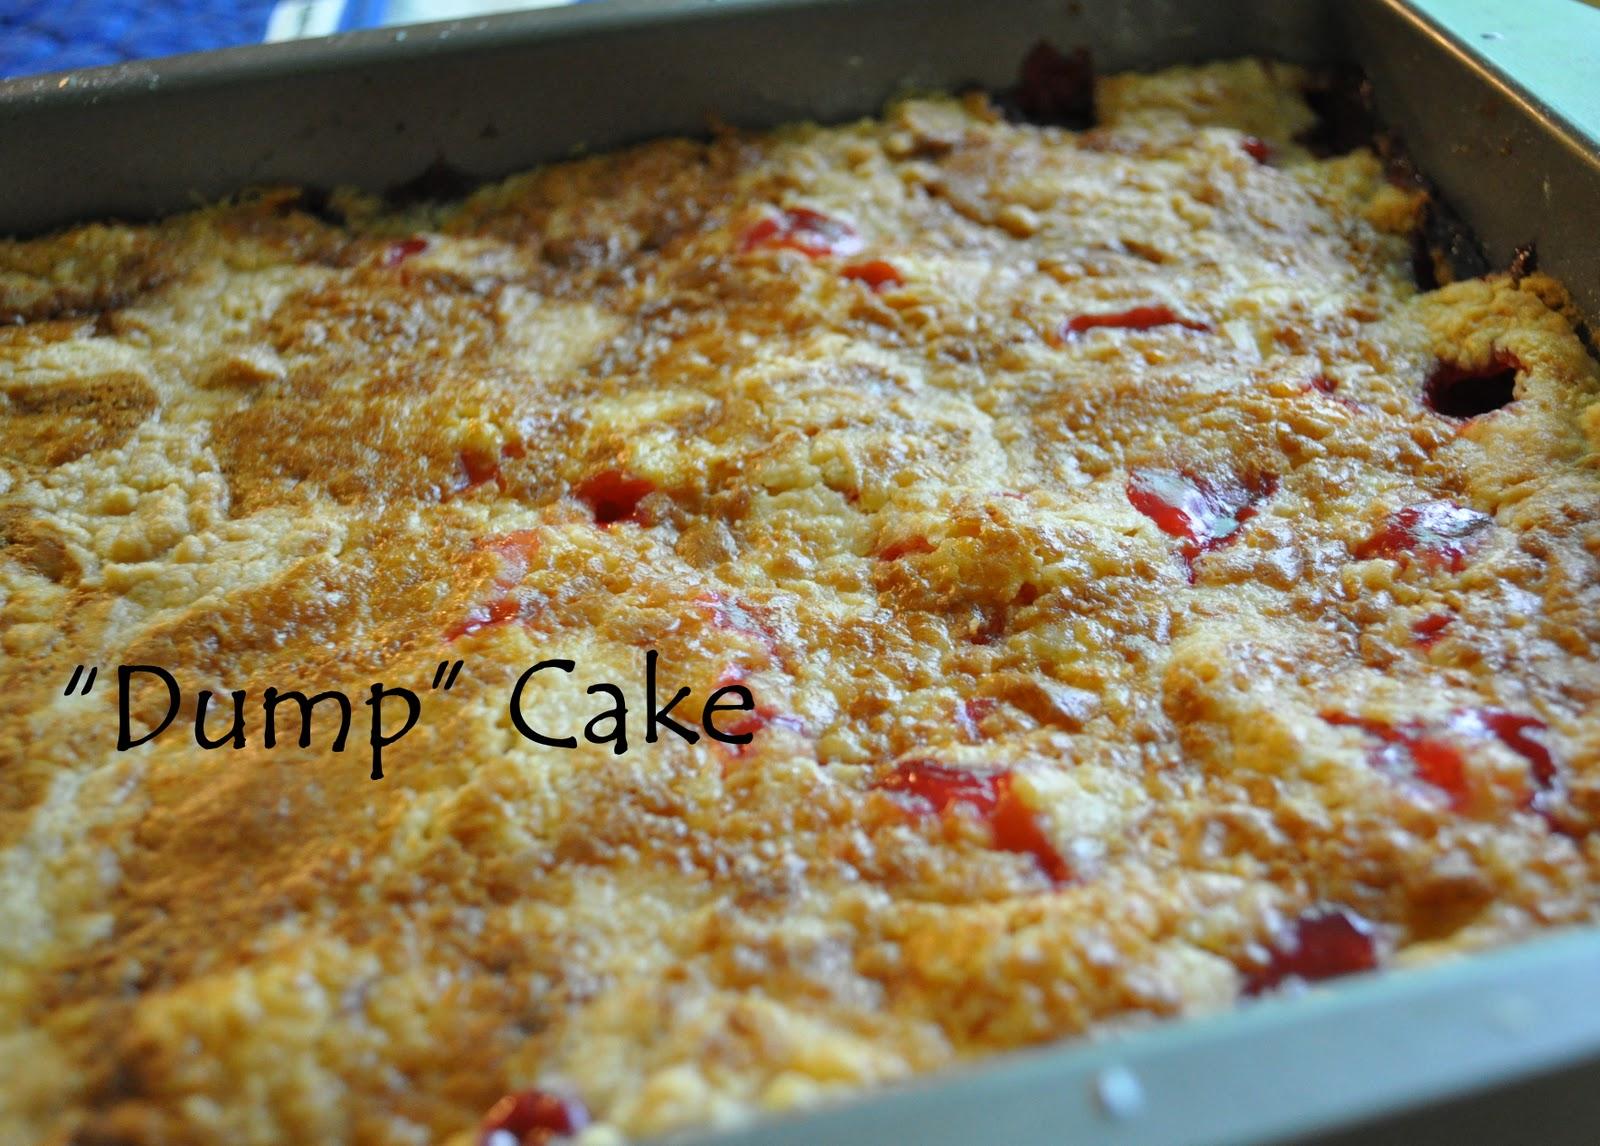 Cake Recipe Cake Dump Recipes Watermelon Wallpaper Rainbow Find Free HD for Desktop [freshlhys.tk]